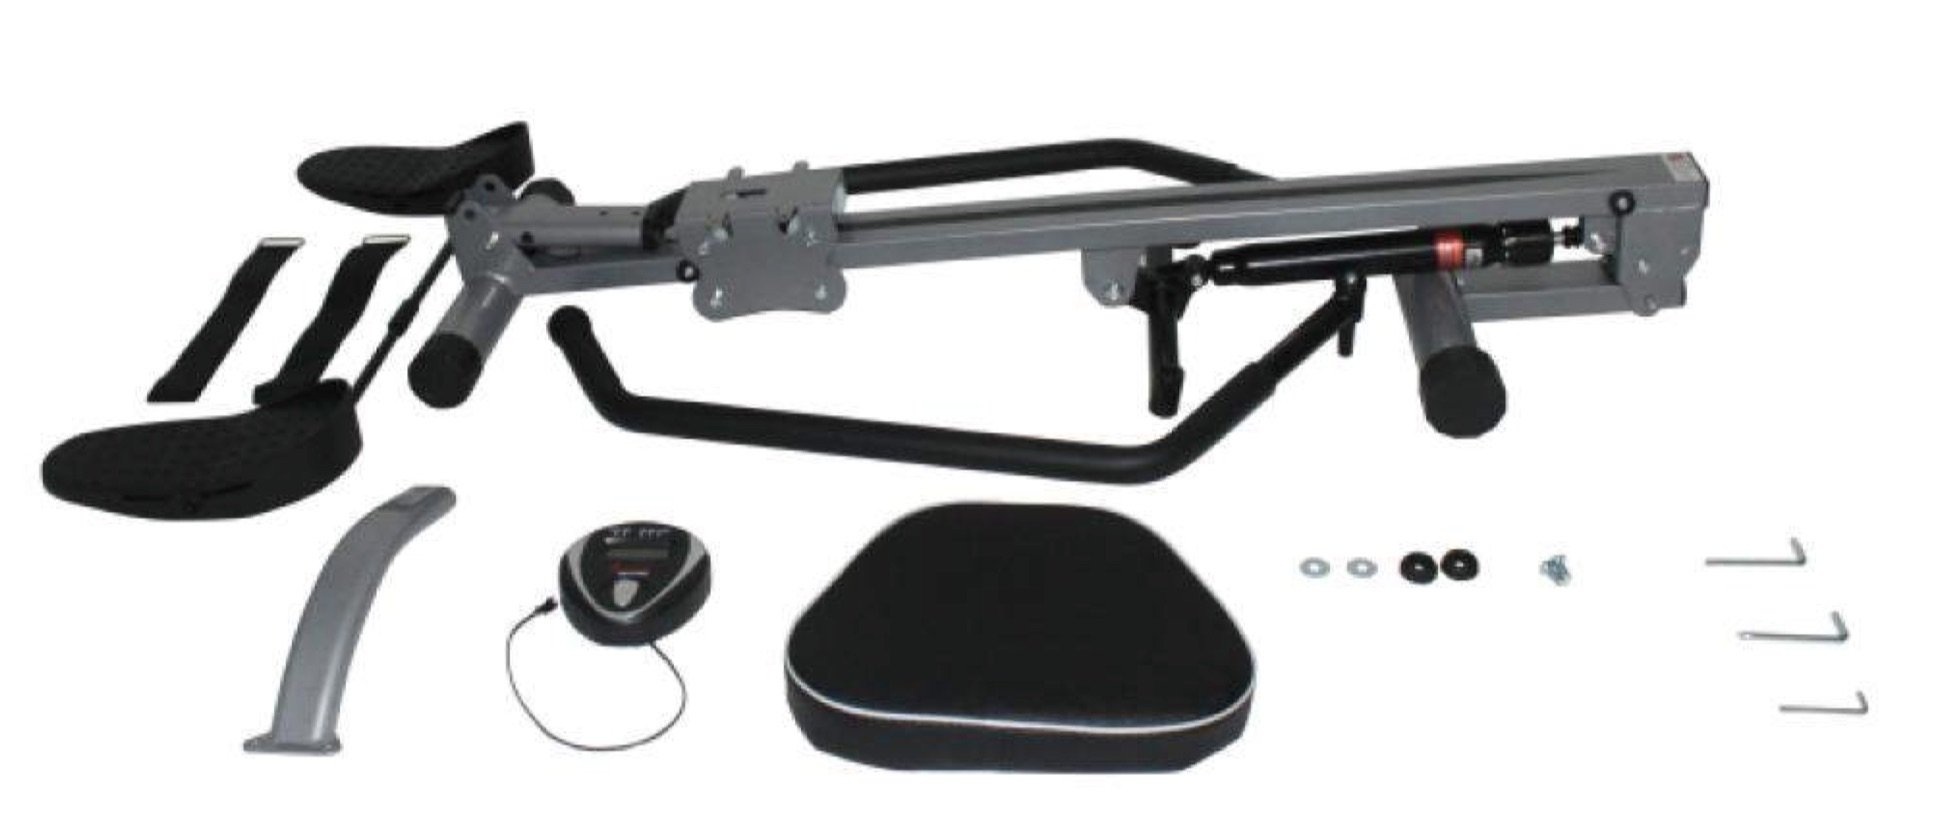 SF-RW1410 Manual Setup Assembly Photo